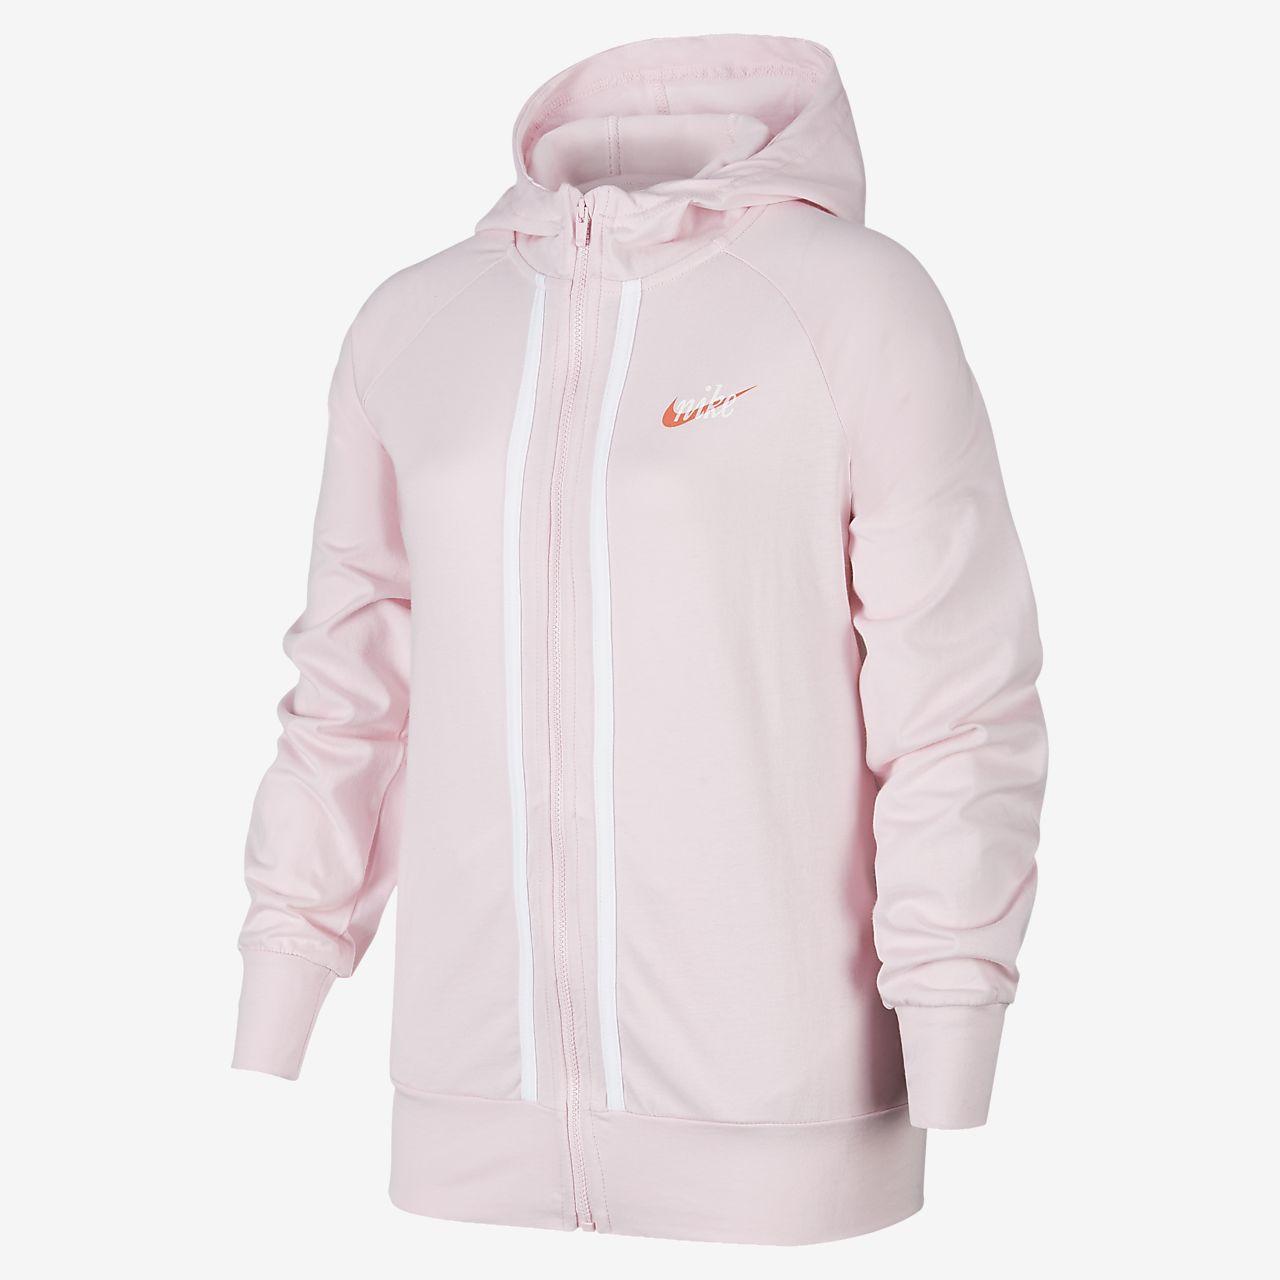 Nike Sportswear 大童(女孩)全长拉链开襟连帽衫